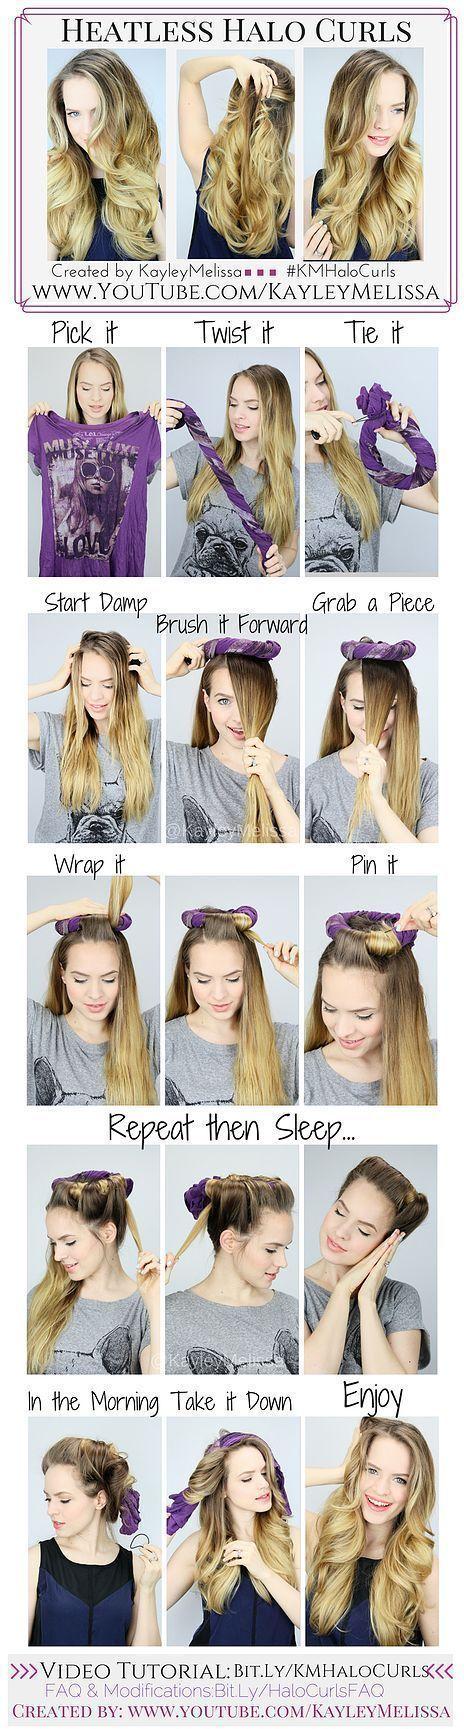 cool Heatless Halo Curls Hair Tutorial hair long hair curly hair diy hair hairstyles hair tutorials easy hairstyles - Pepino Haircuts